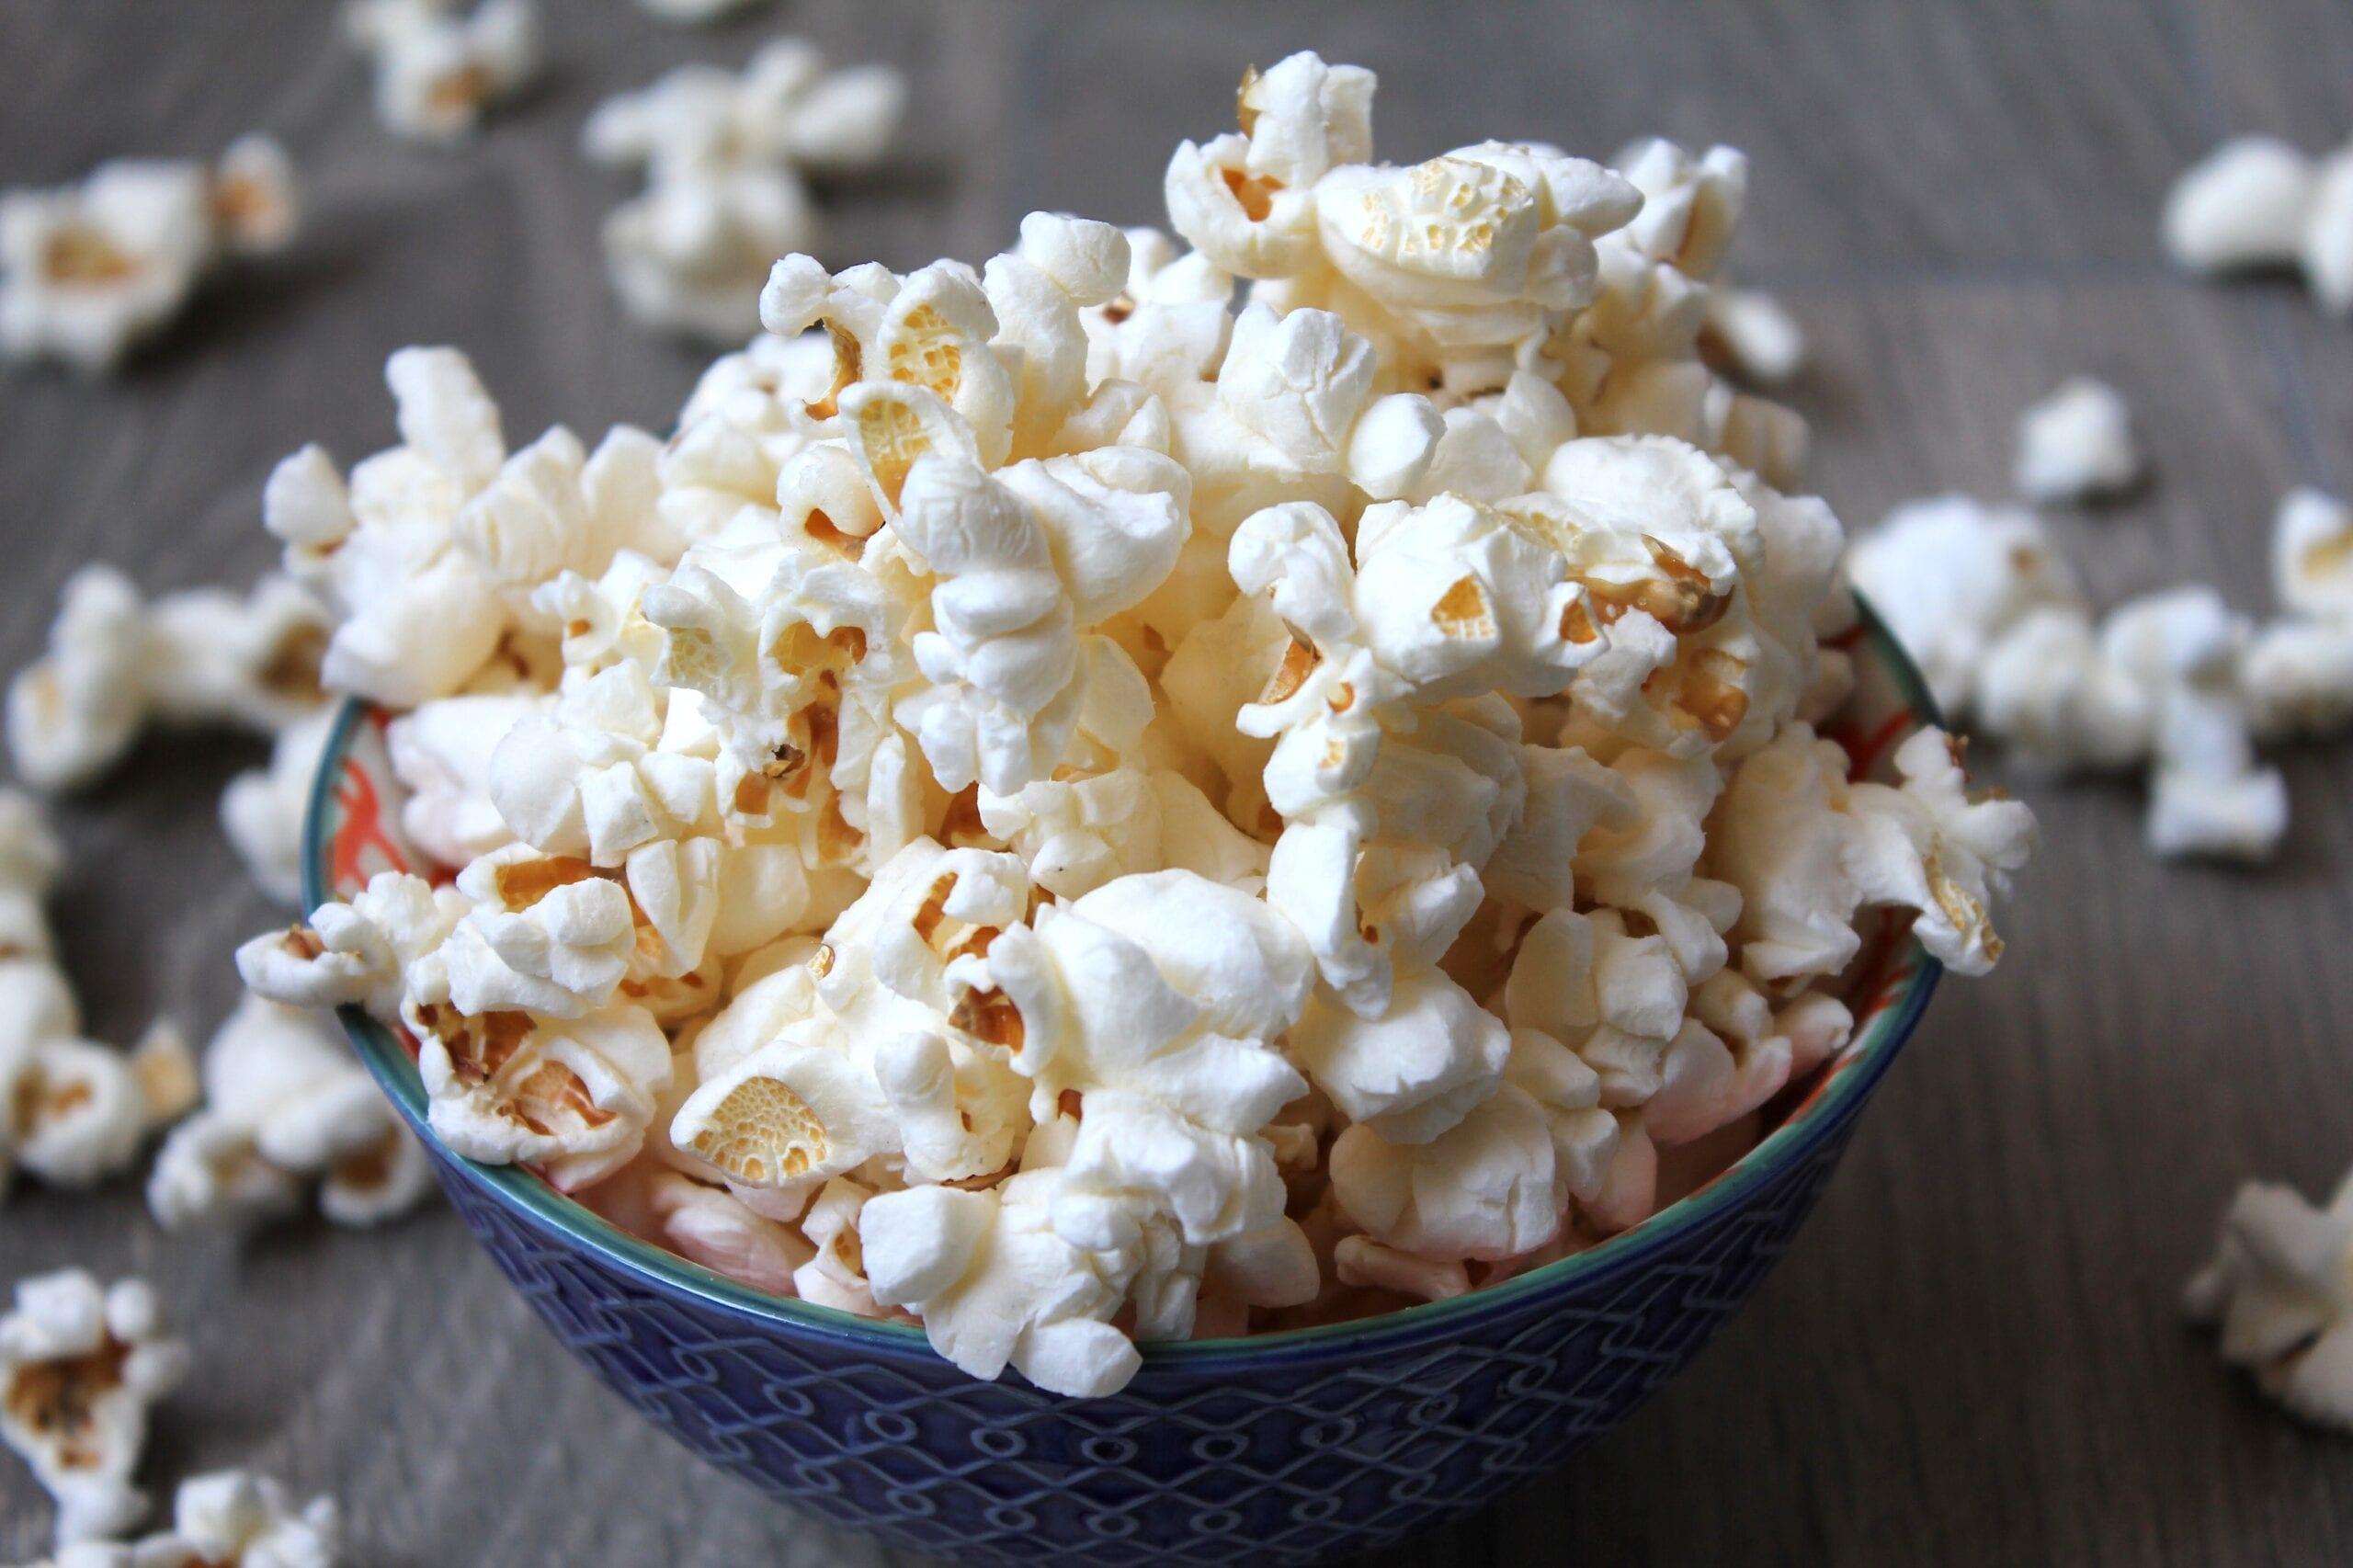 Sunne snacks: 4 digge, enkle og sunne snacks!